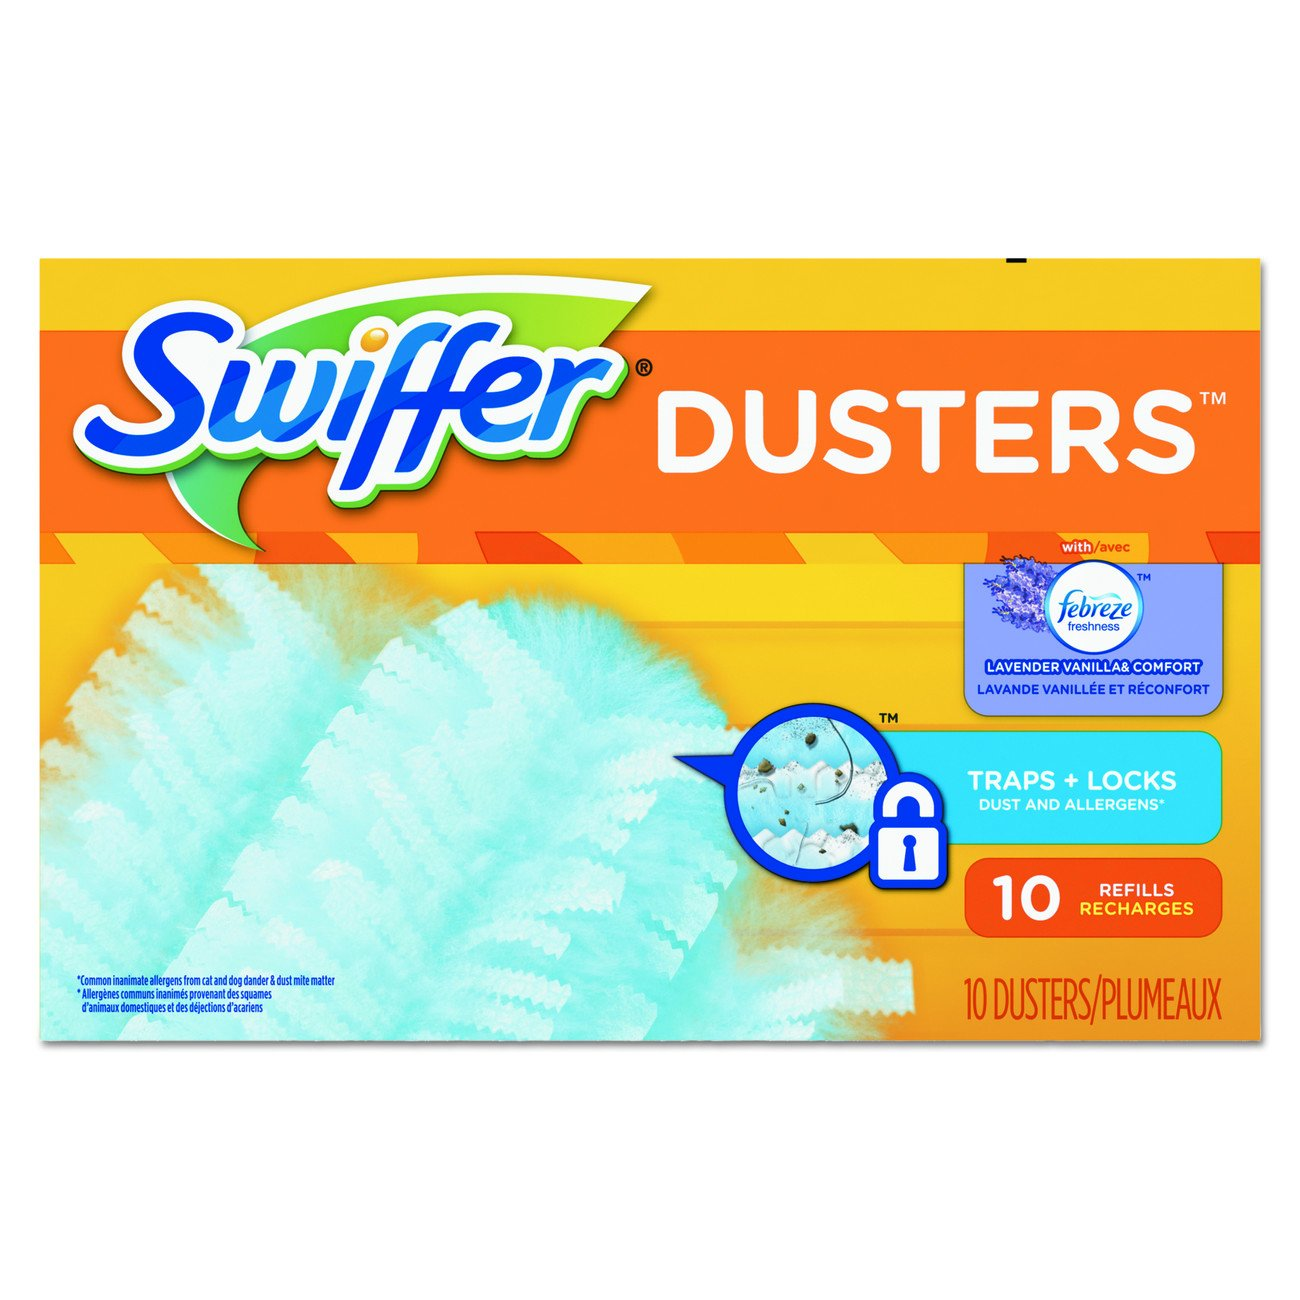 Swiffer 21461 Refill Duster, Dust Lock Fiber, Lavender Vanilla Scent, 4'' Width, 6'' Length, Light Blue (Pack of 40)